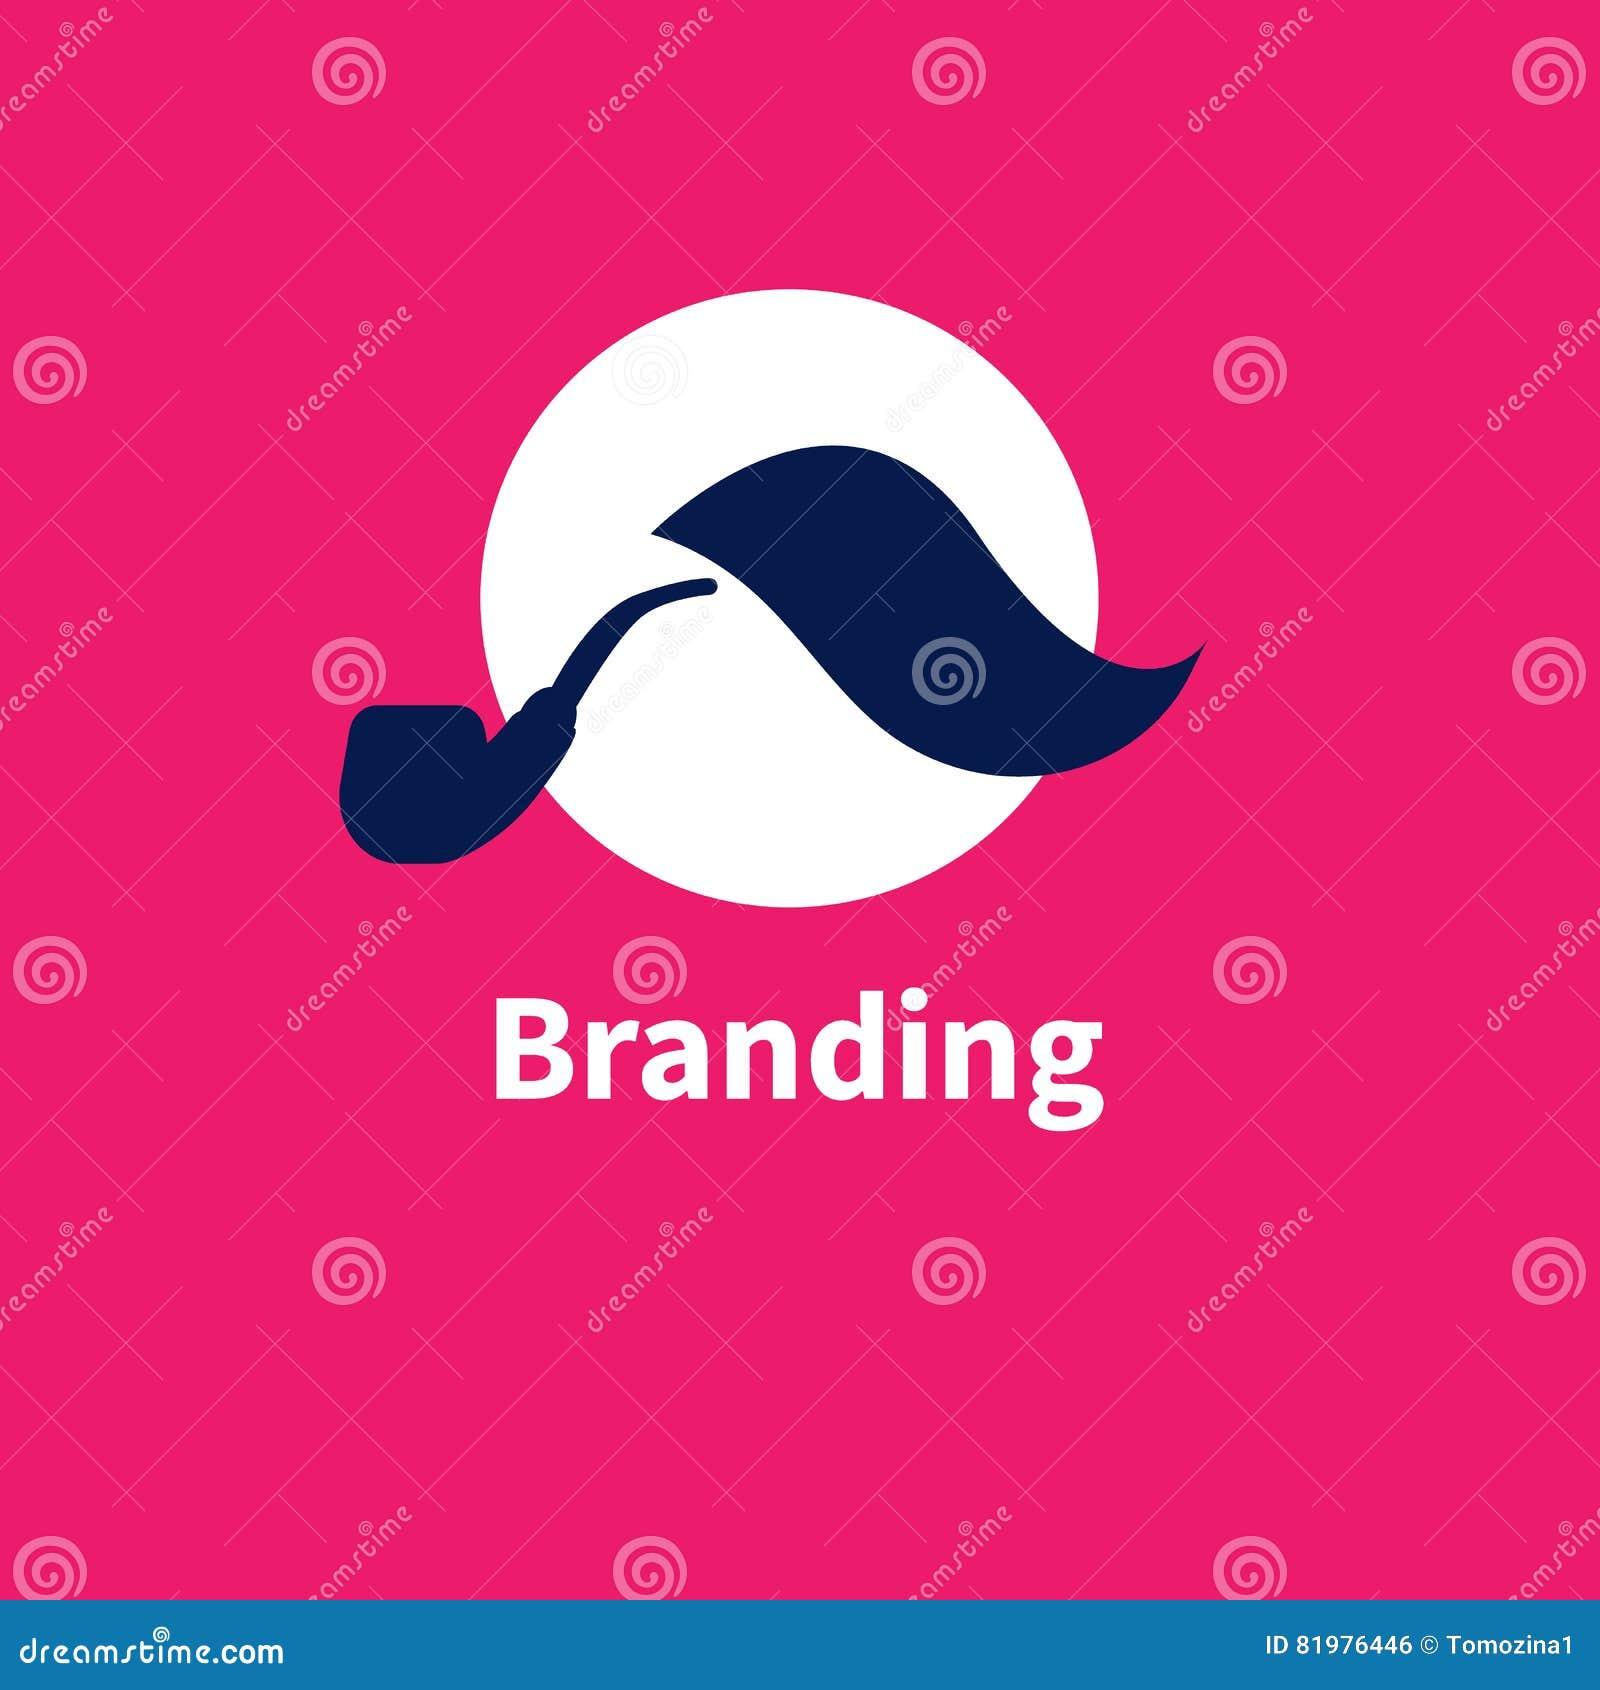 Logo branding Agency stock vector  Illustration of fashion - 81976446